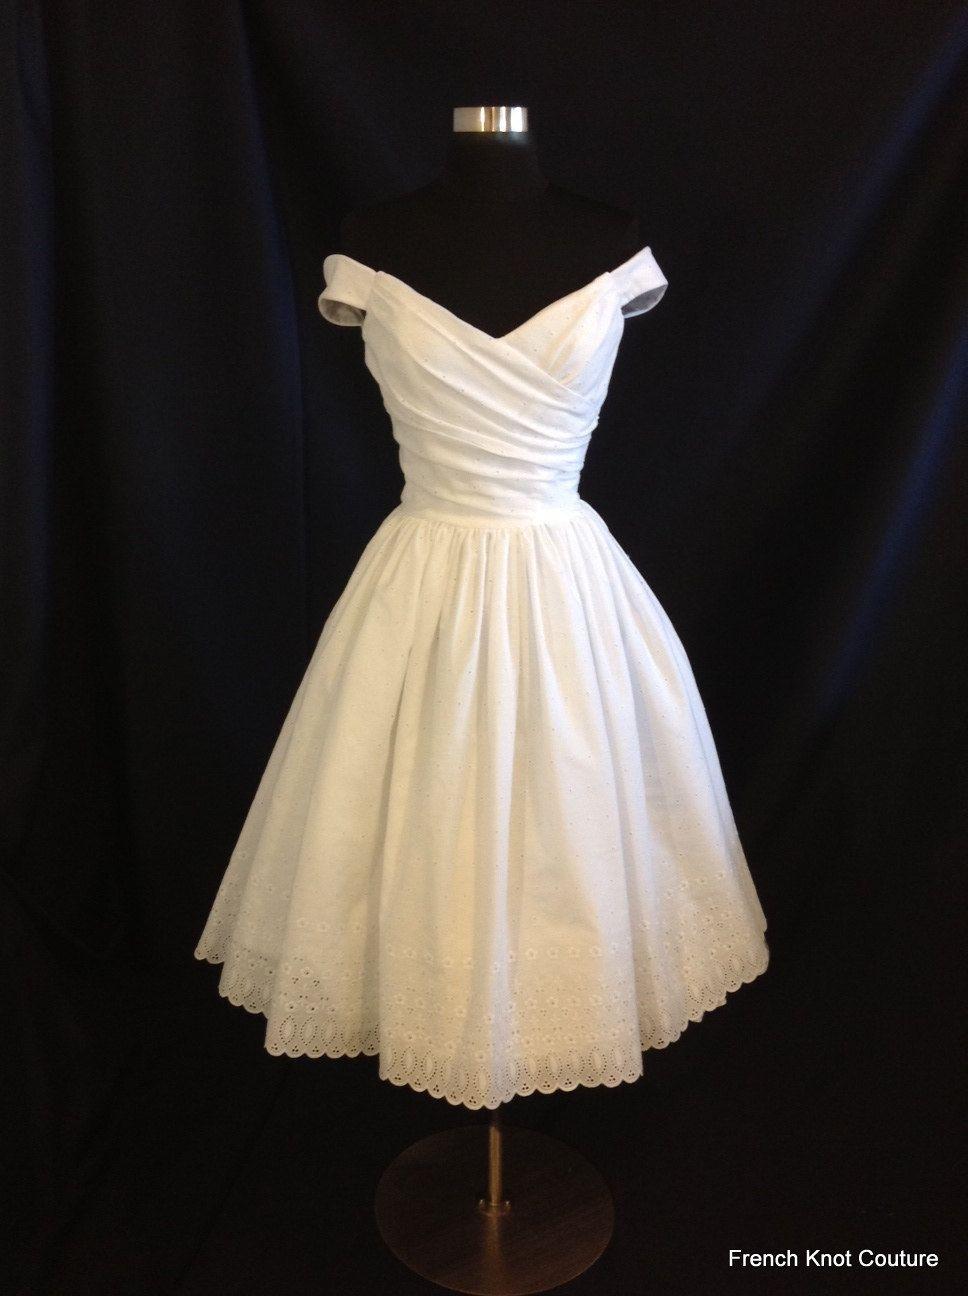 Short Wedding Dress Off Shoulder Cotton Eyelet Flir Tini Etsy Tea Length Wedding Dress Reception Dress Short Wedding Dress [ 1296 x 968 Pixel ]